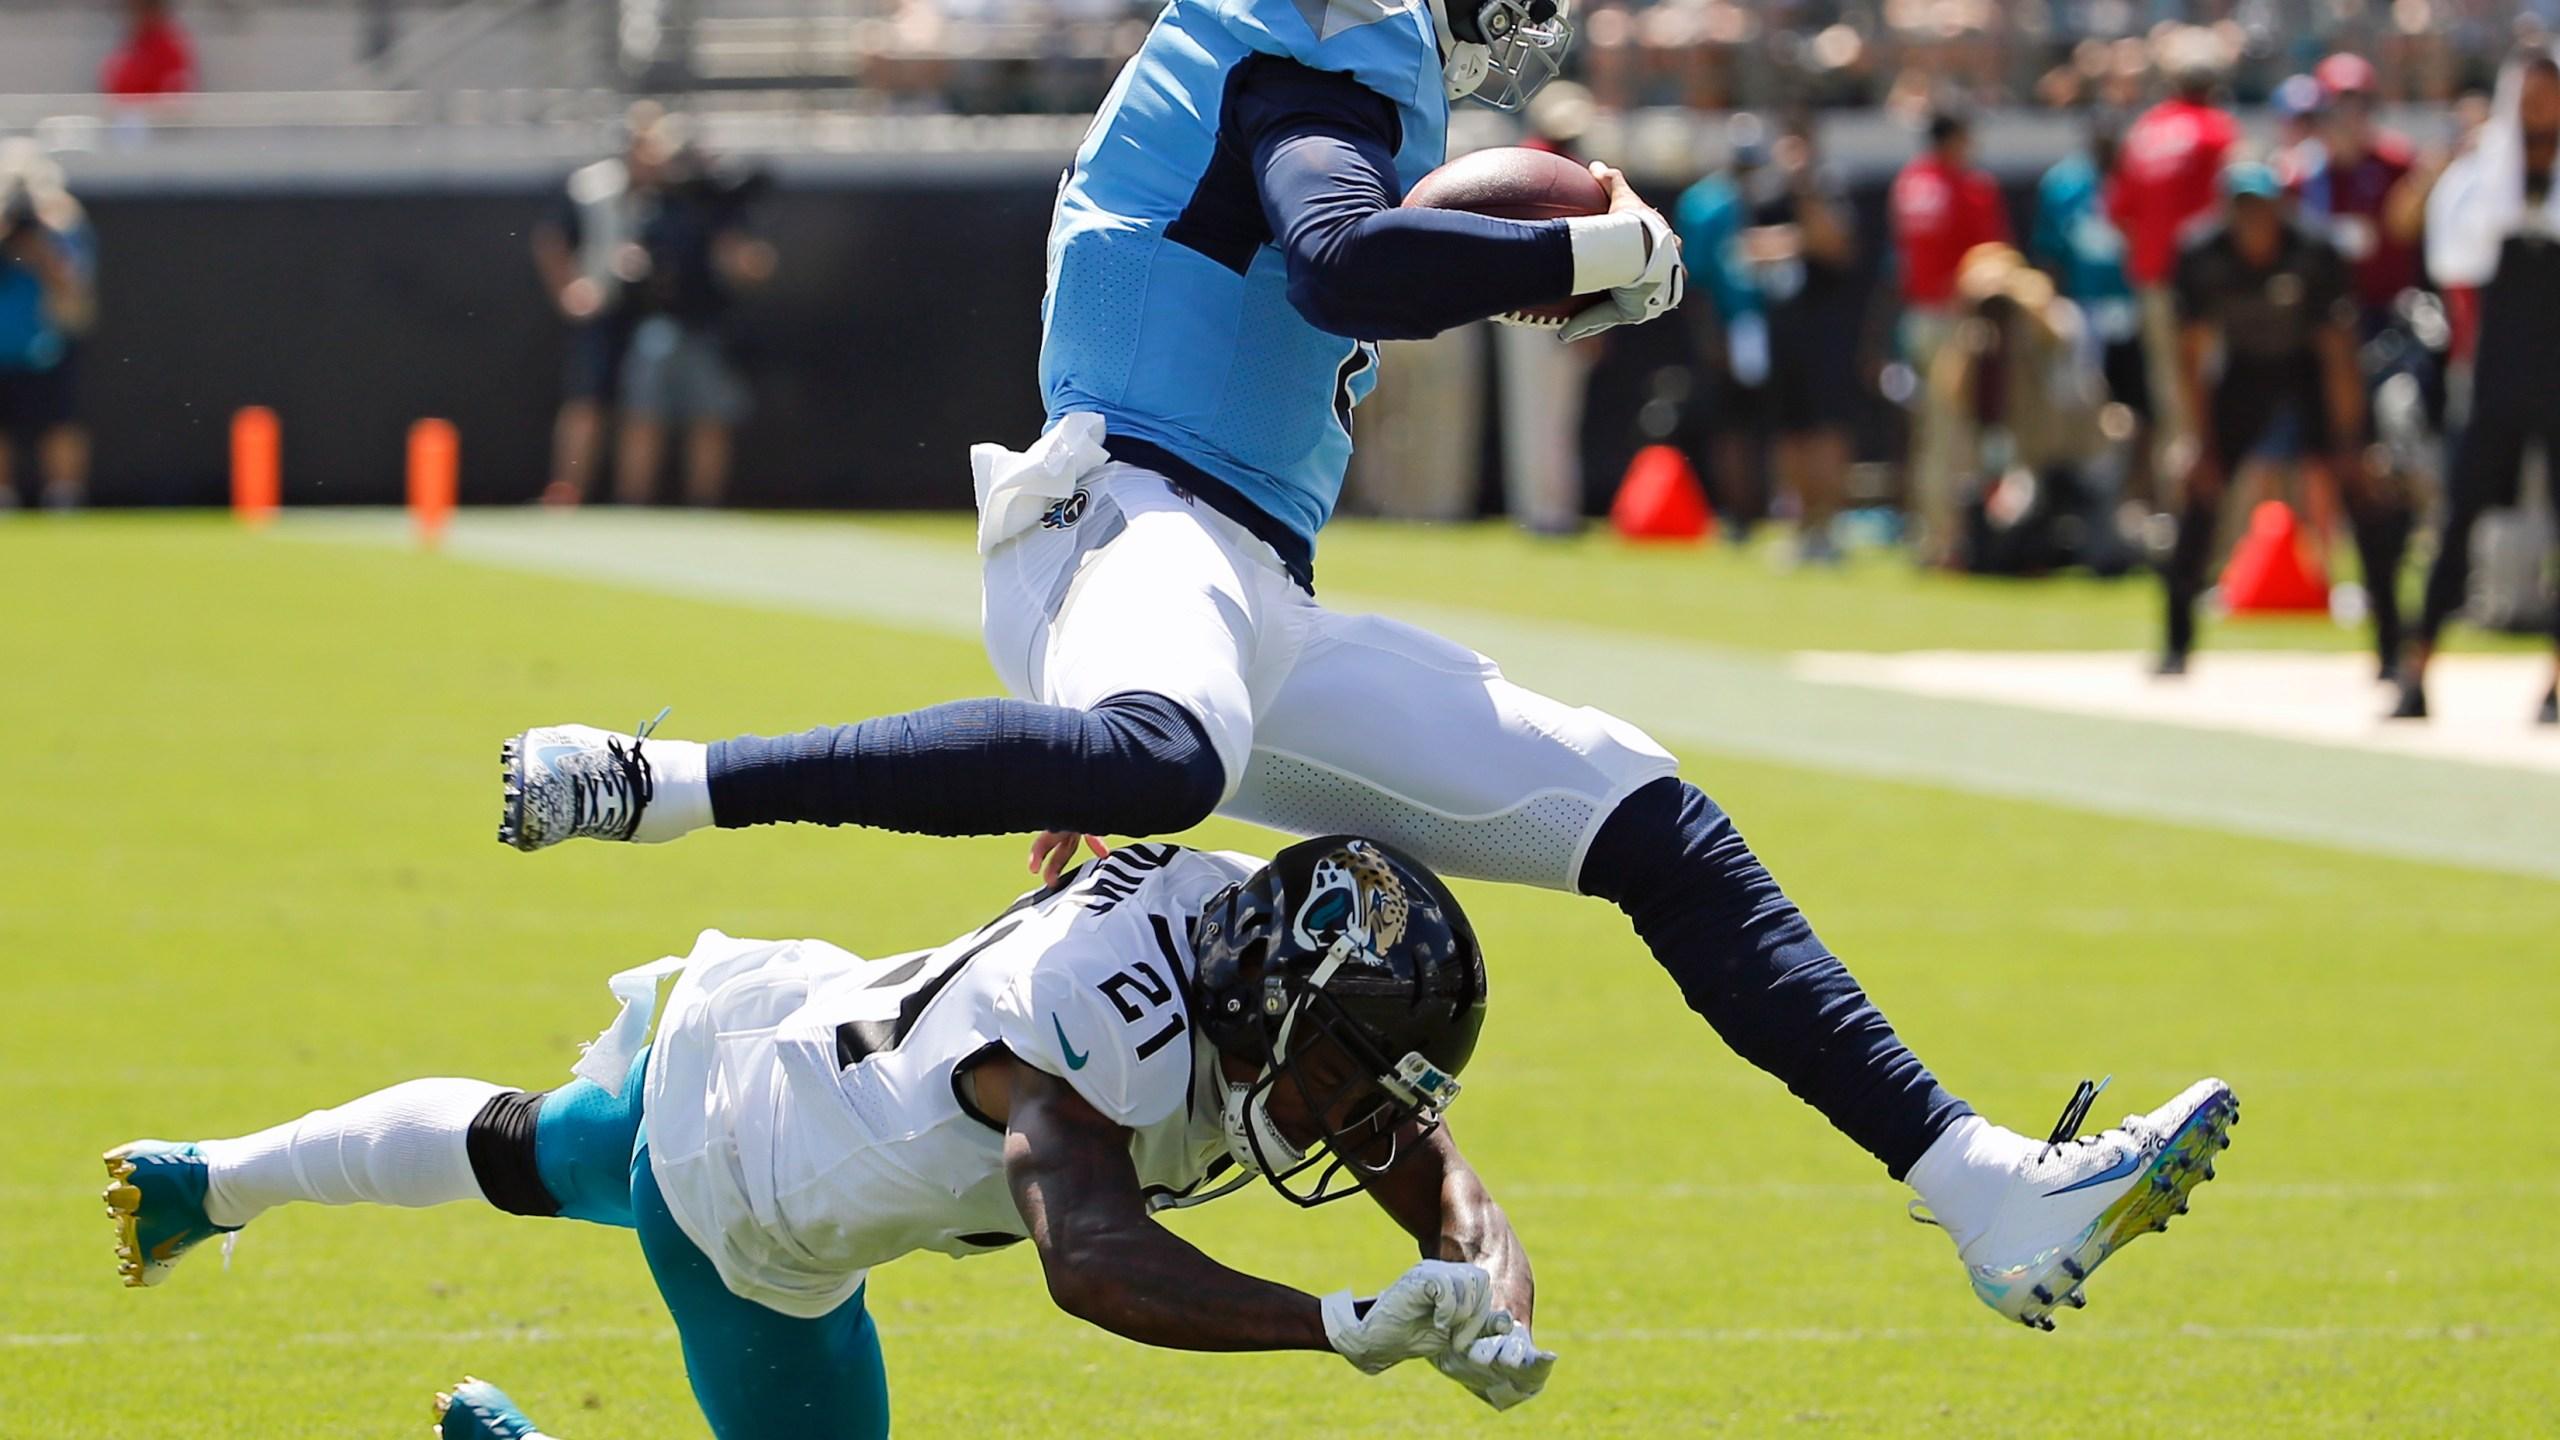 Titans Jaguars Football_1537735101370